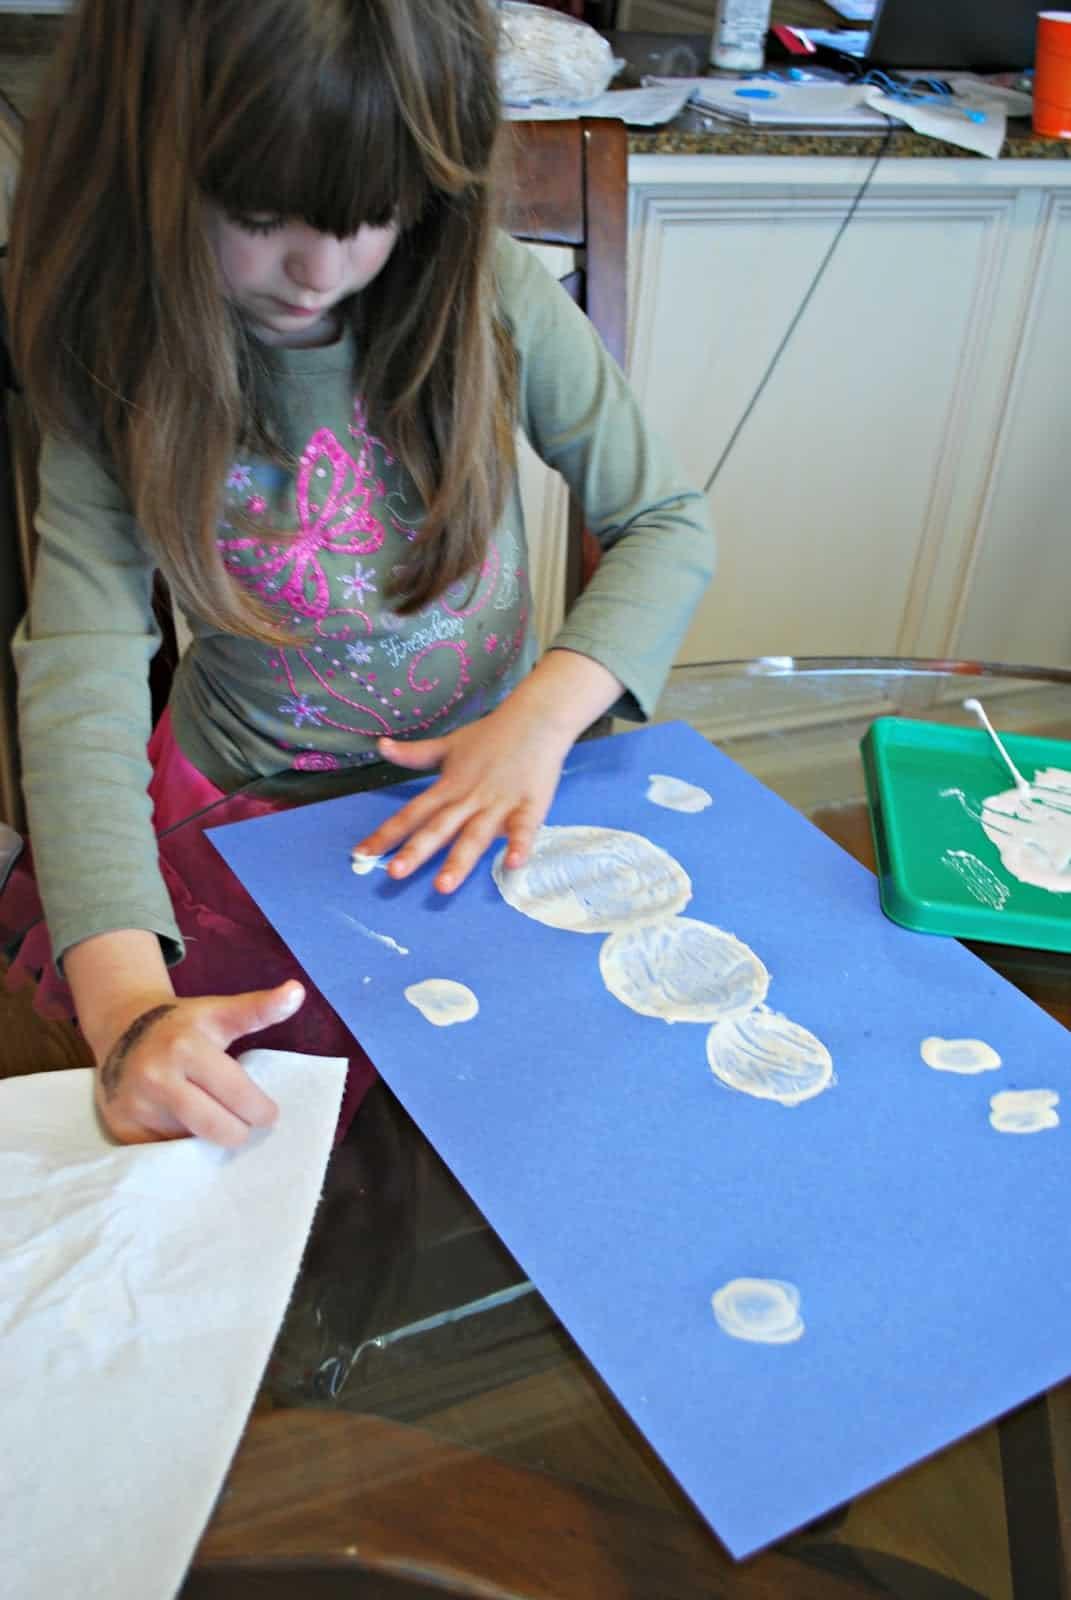 child making a snowman craft